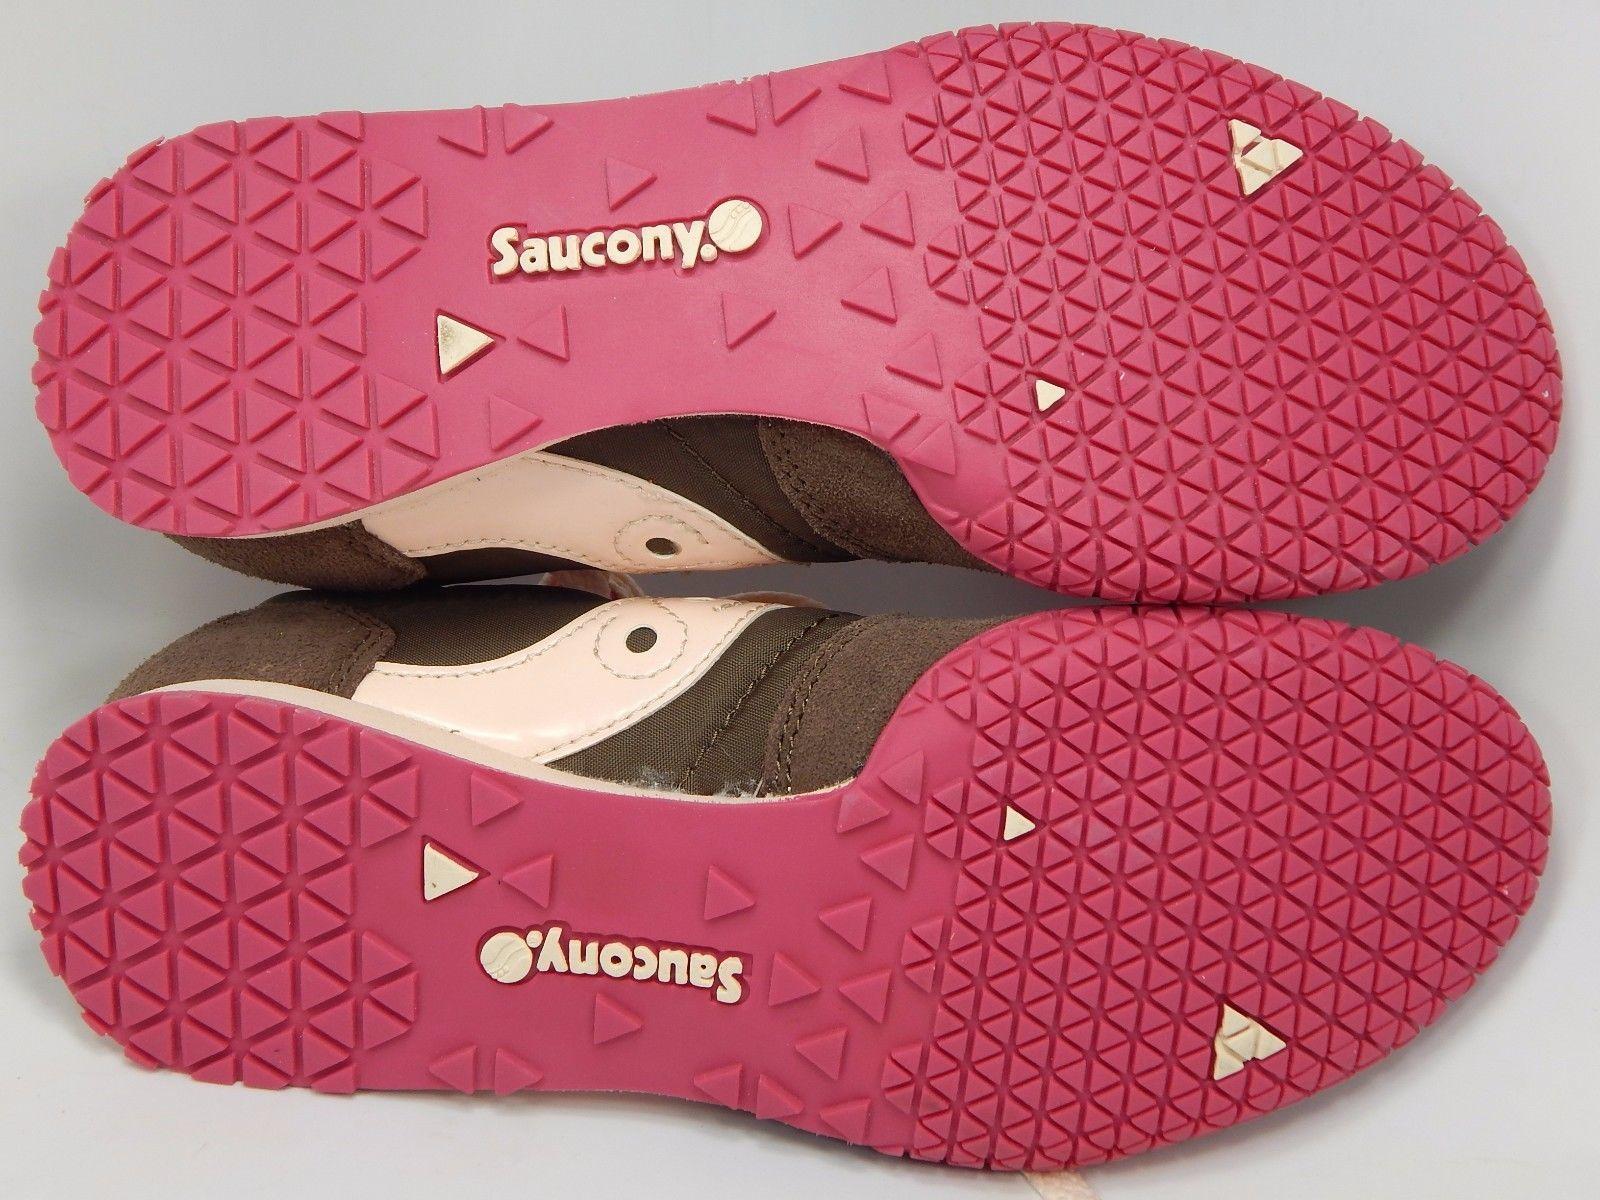 Saucony Original Bullet Women's Running Shoes Size 7 M (B) EU 38 Brown S1943-129